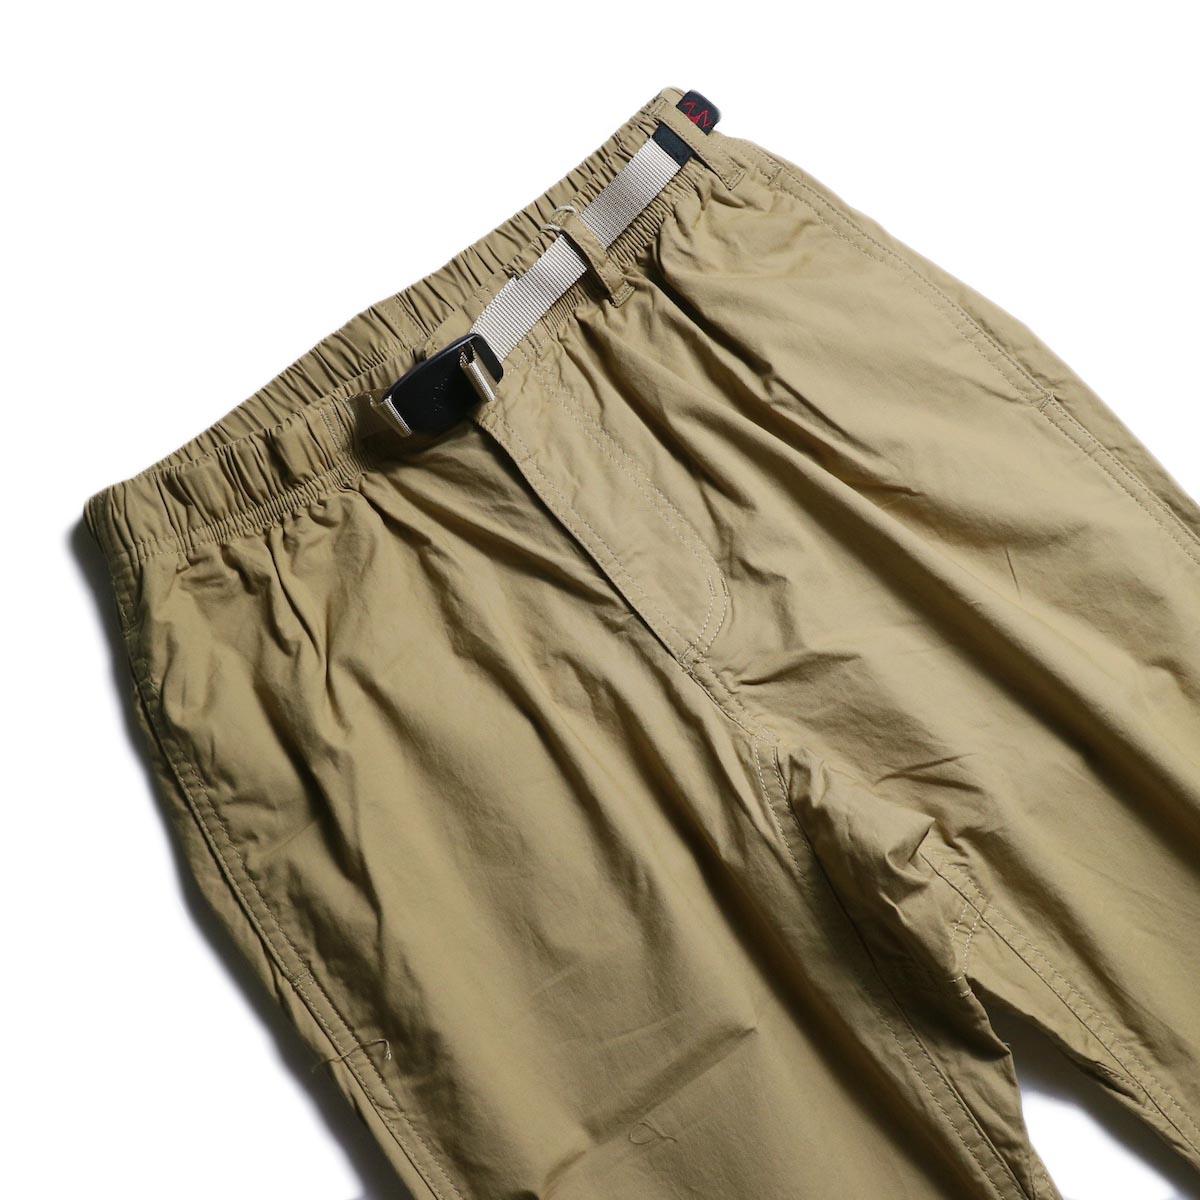 GRAMICCI / Weather NN-Pants Just Cut (Sand)ウエスト